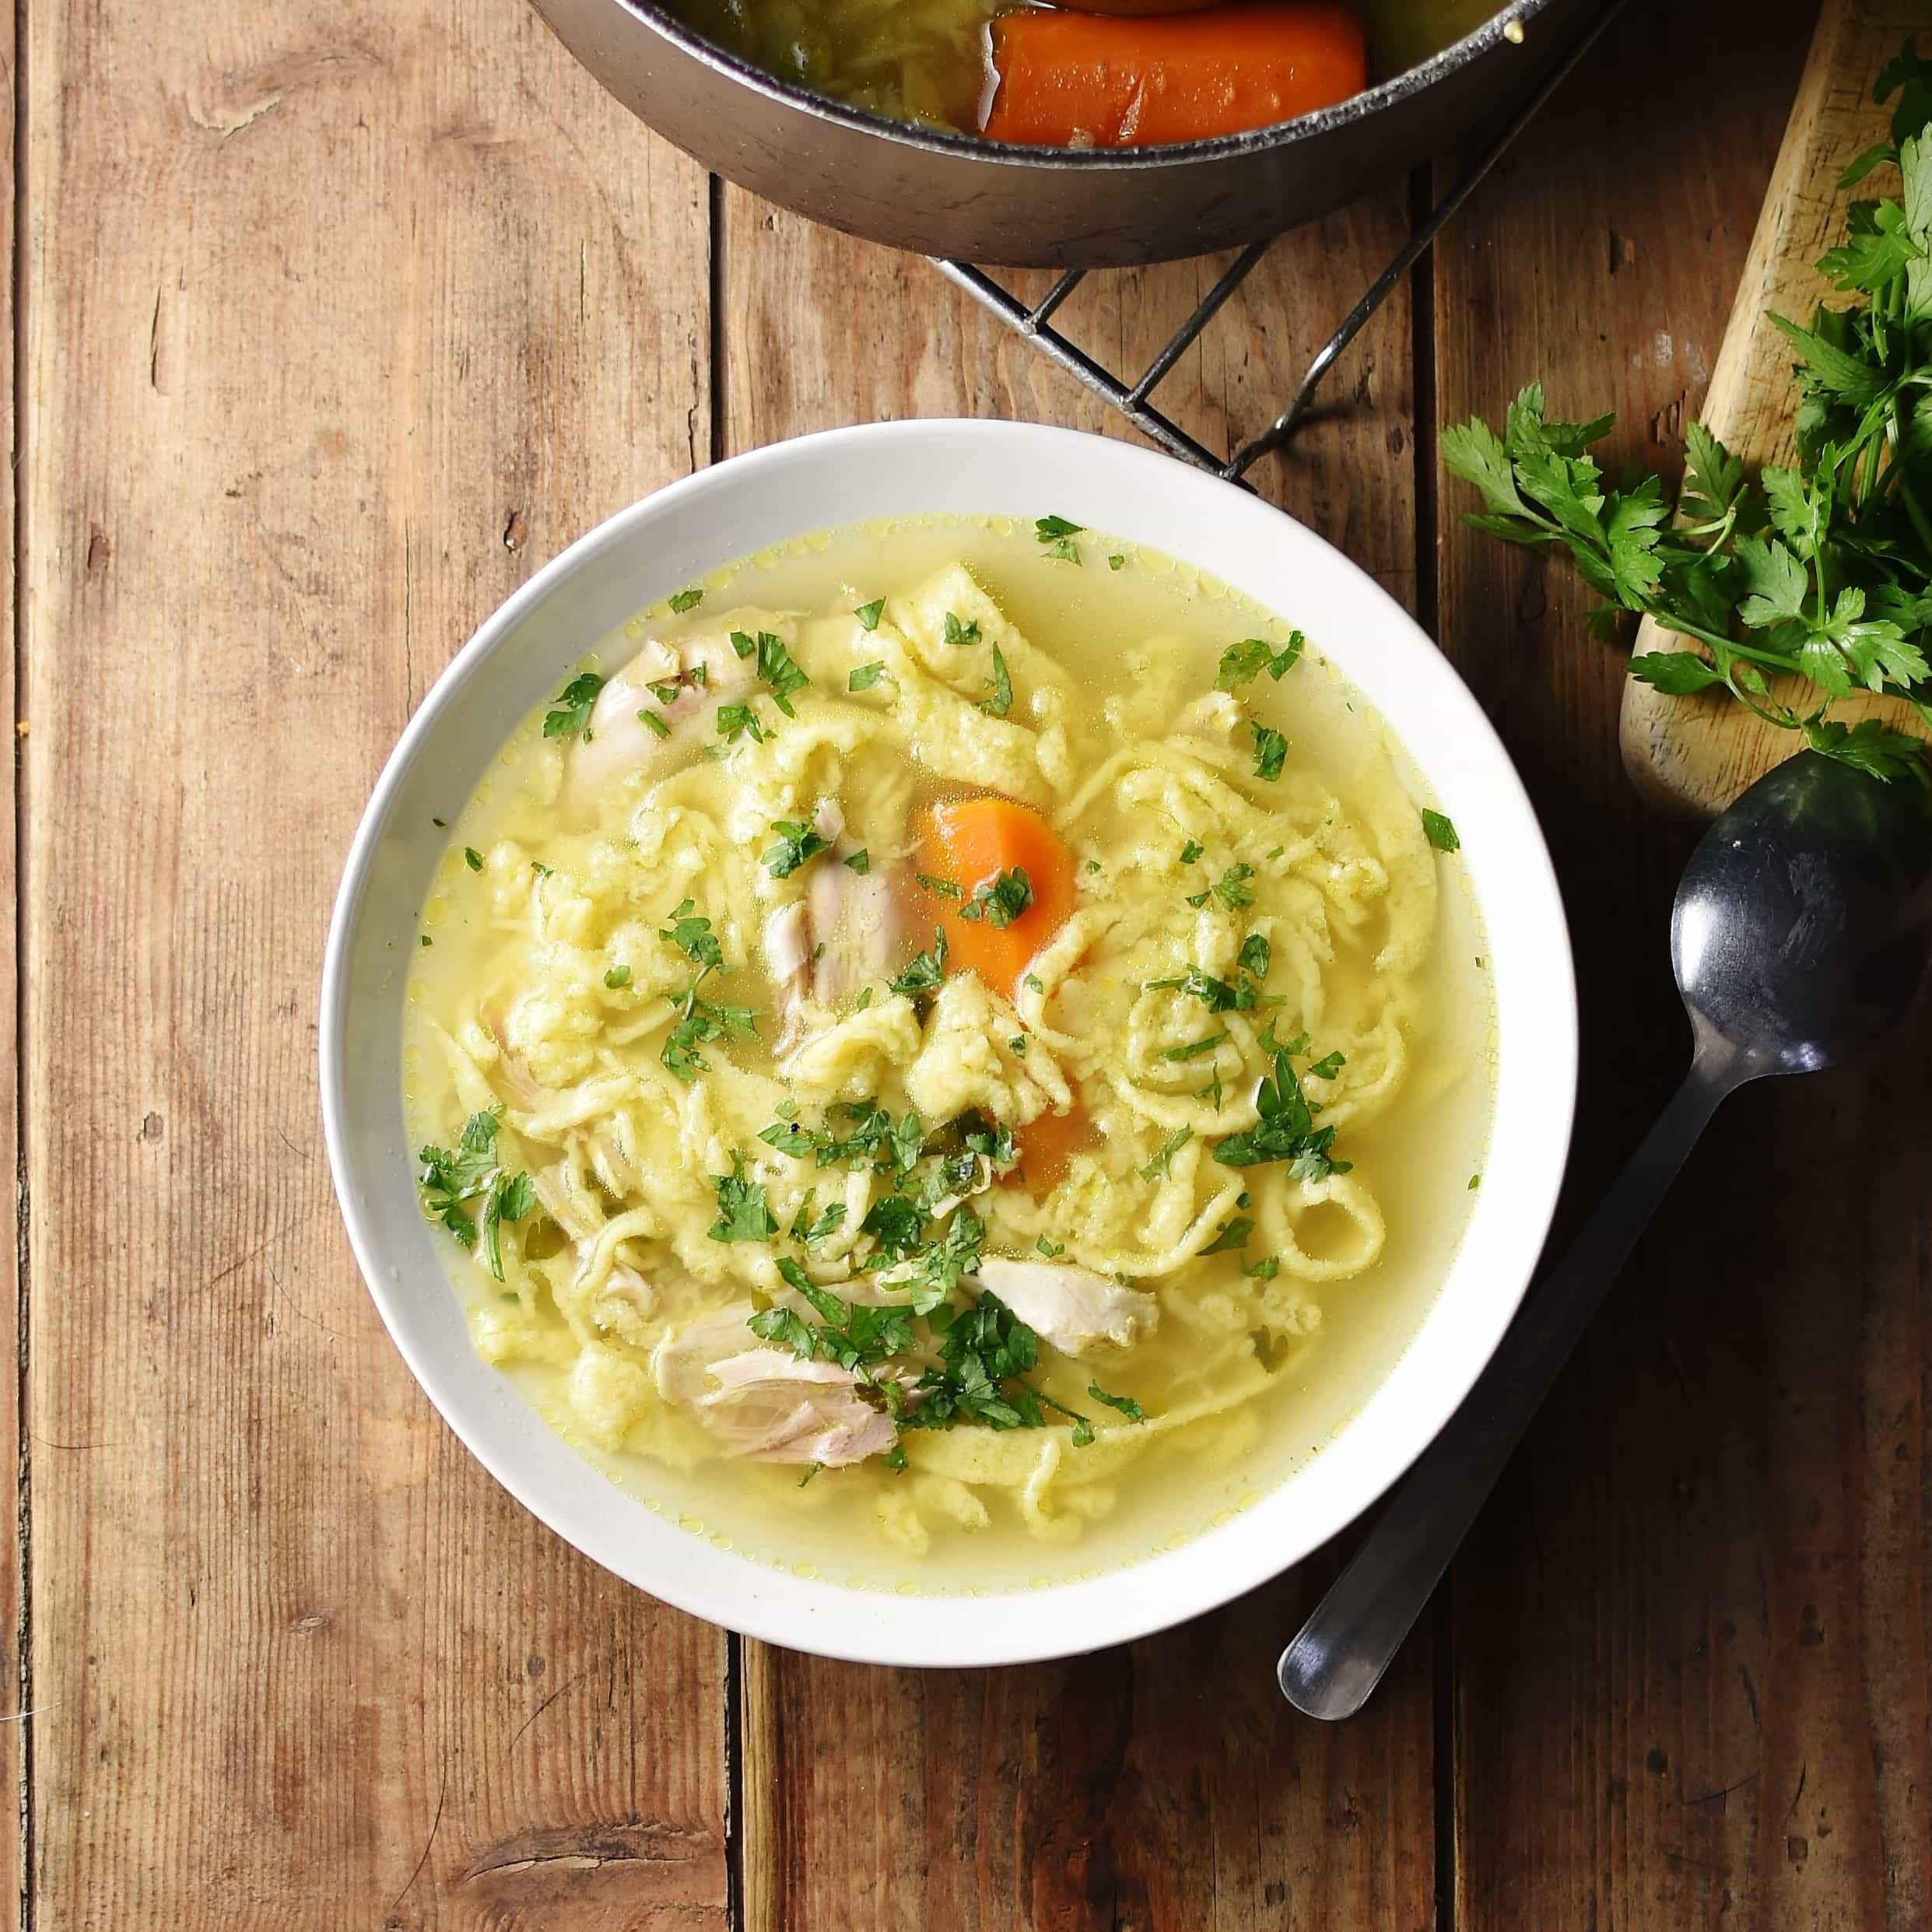 polish egg drop noodles chicken soup (lane kluski